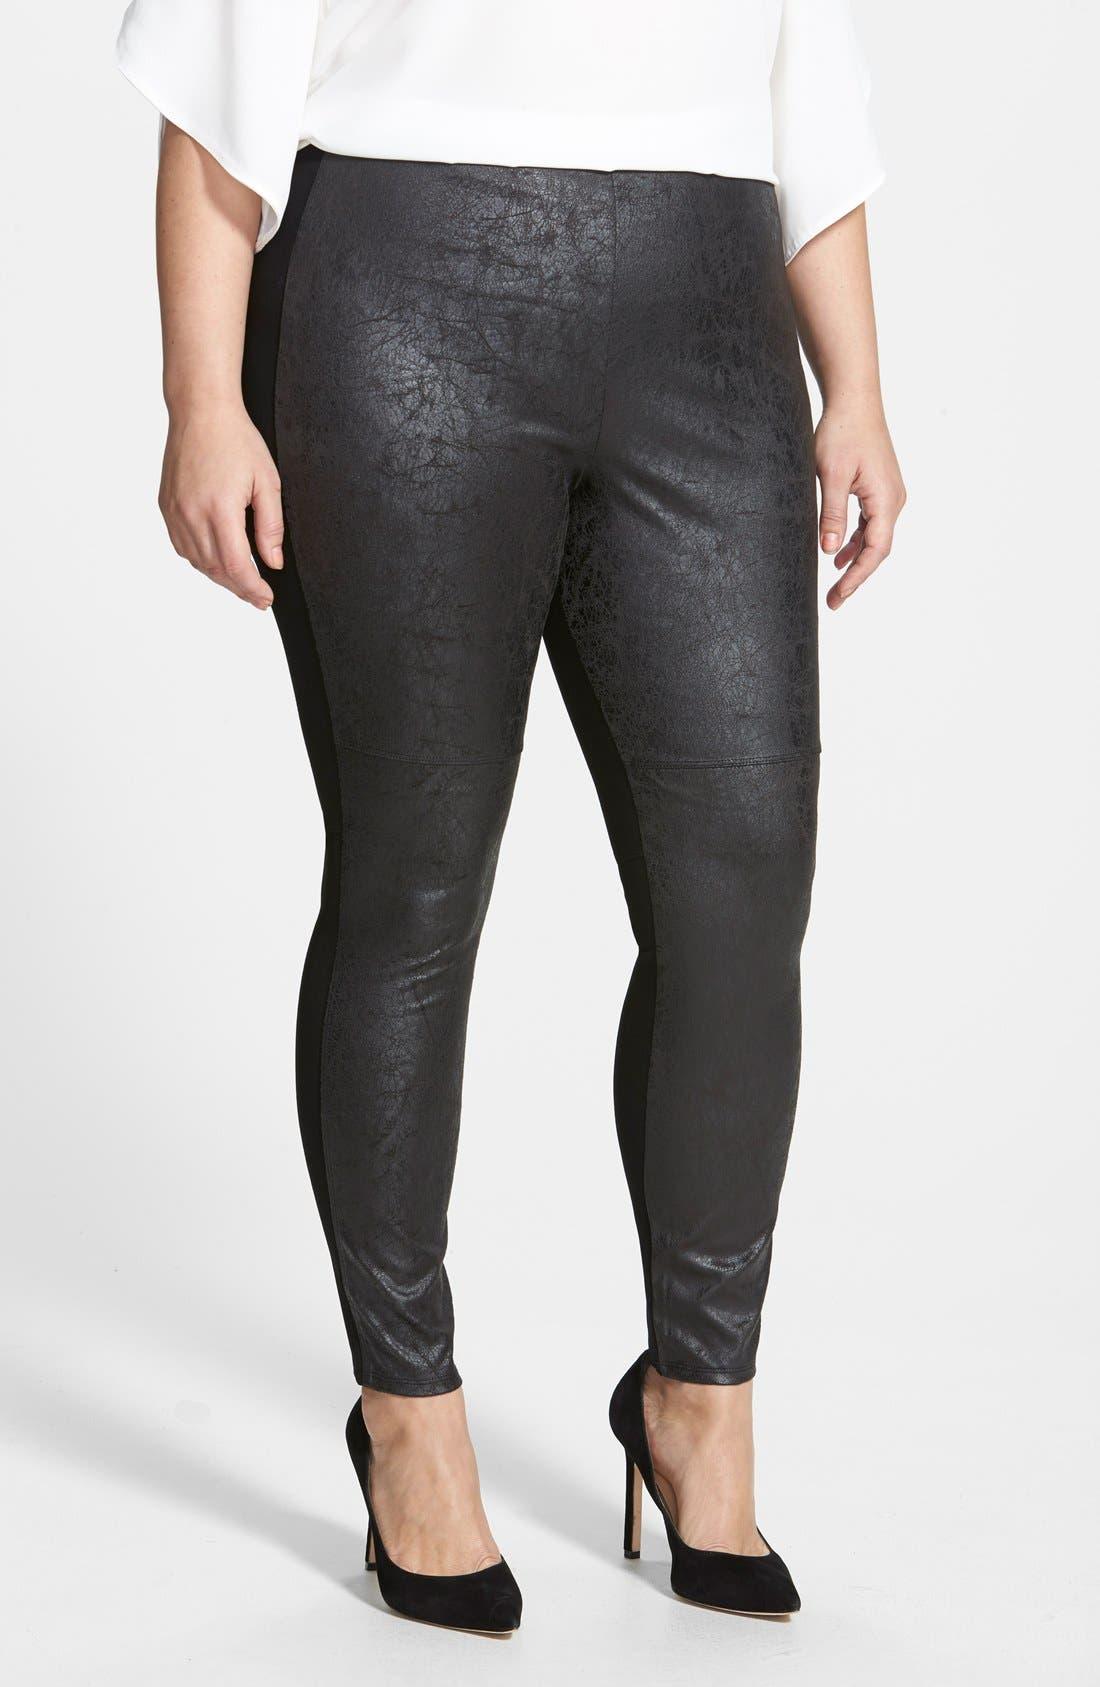 Distressed Faux Leather & Ponte Knit Leggings,                             Main thumbnail 1, color,                             001